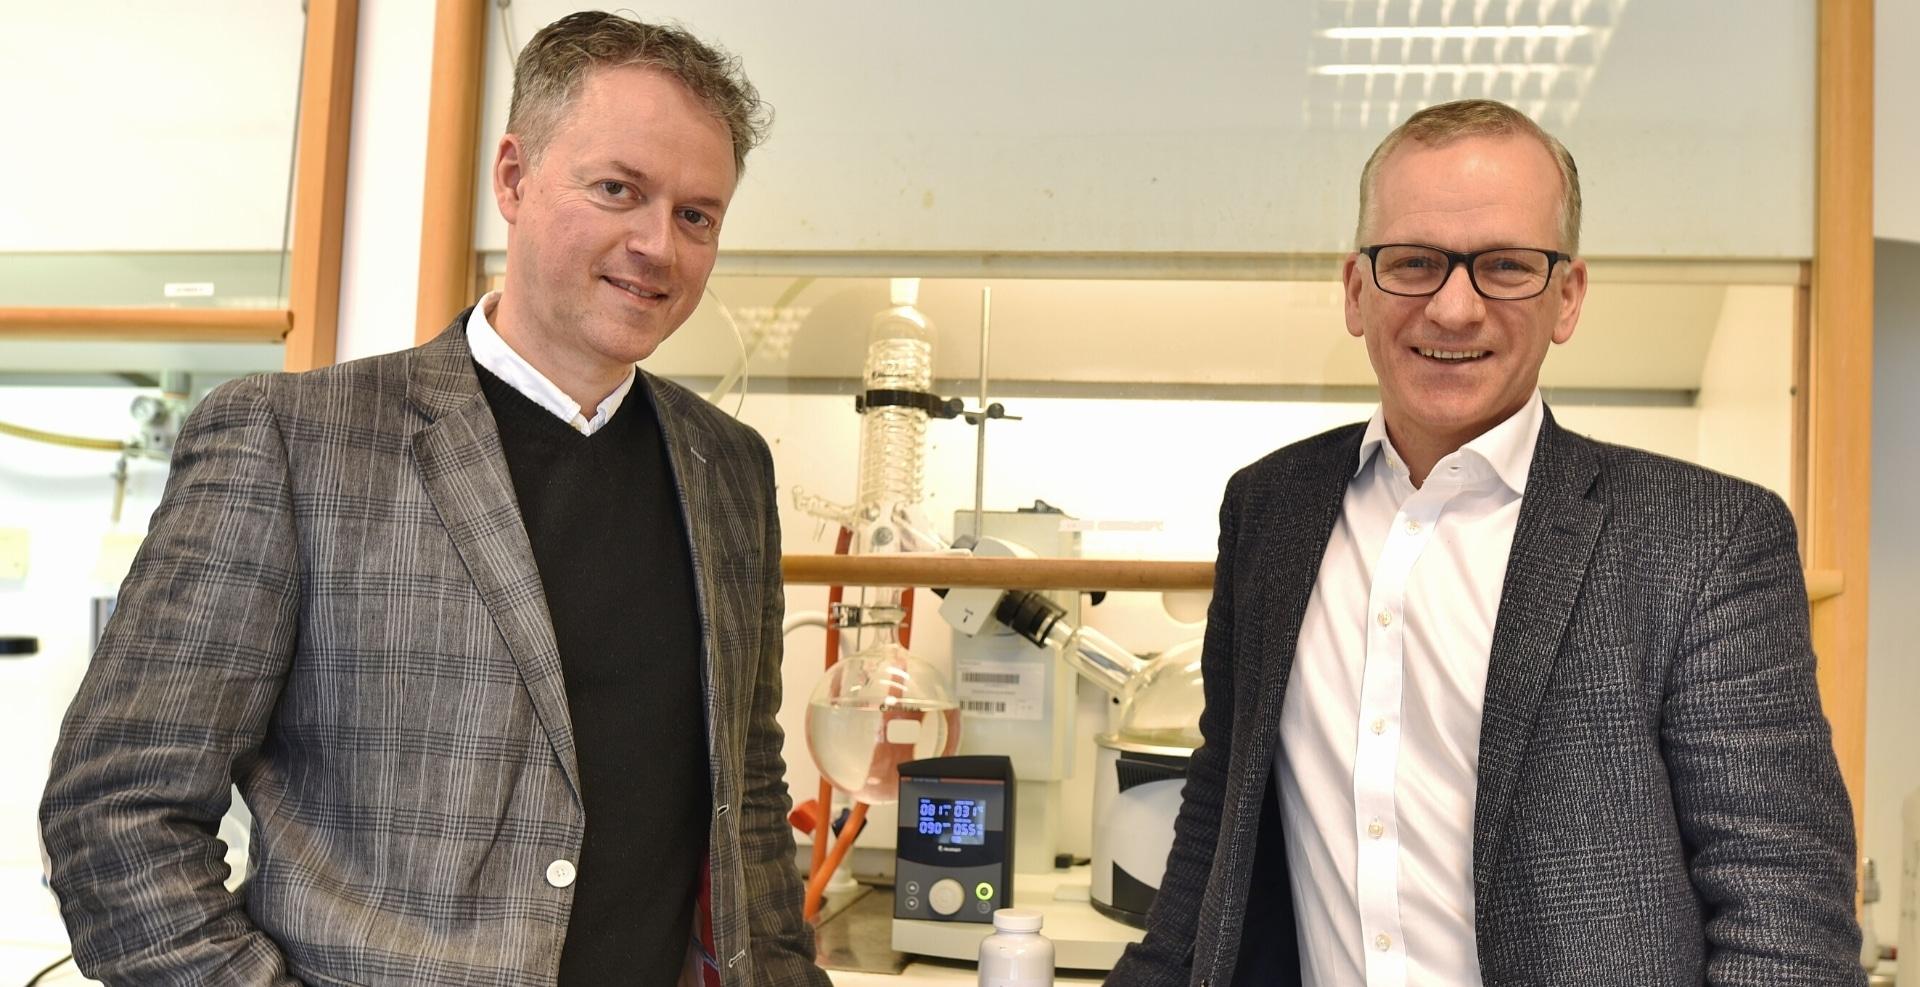 Founder Hogne Hallaråker and CEO Ole Arne Eiksund of Arctic Bioscience